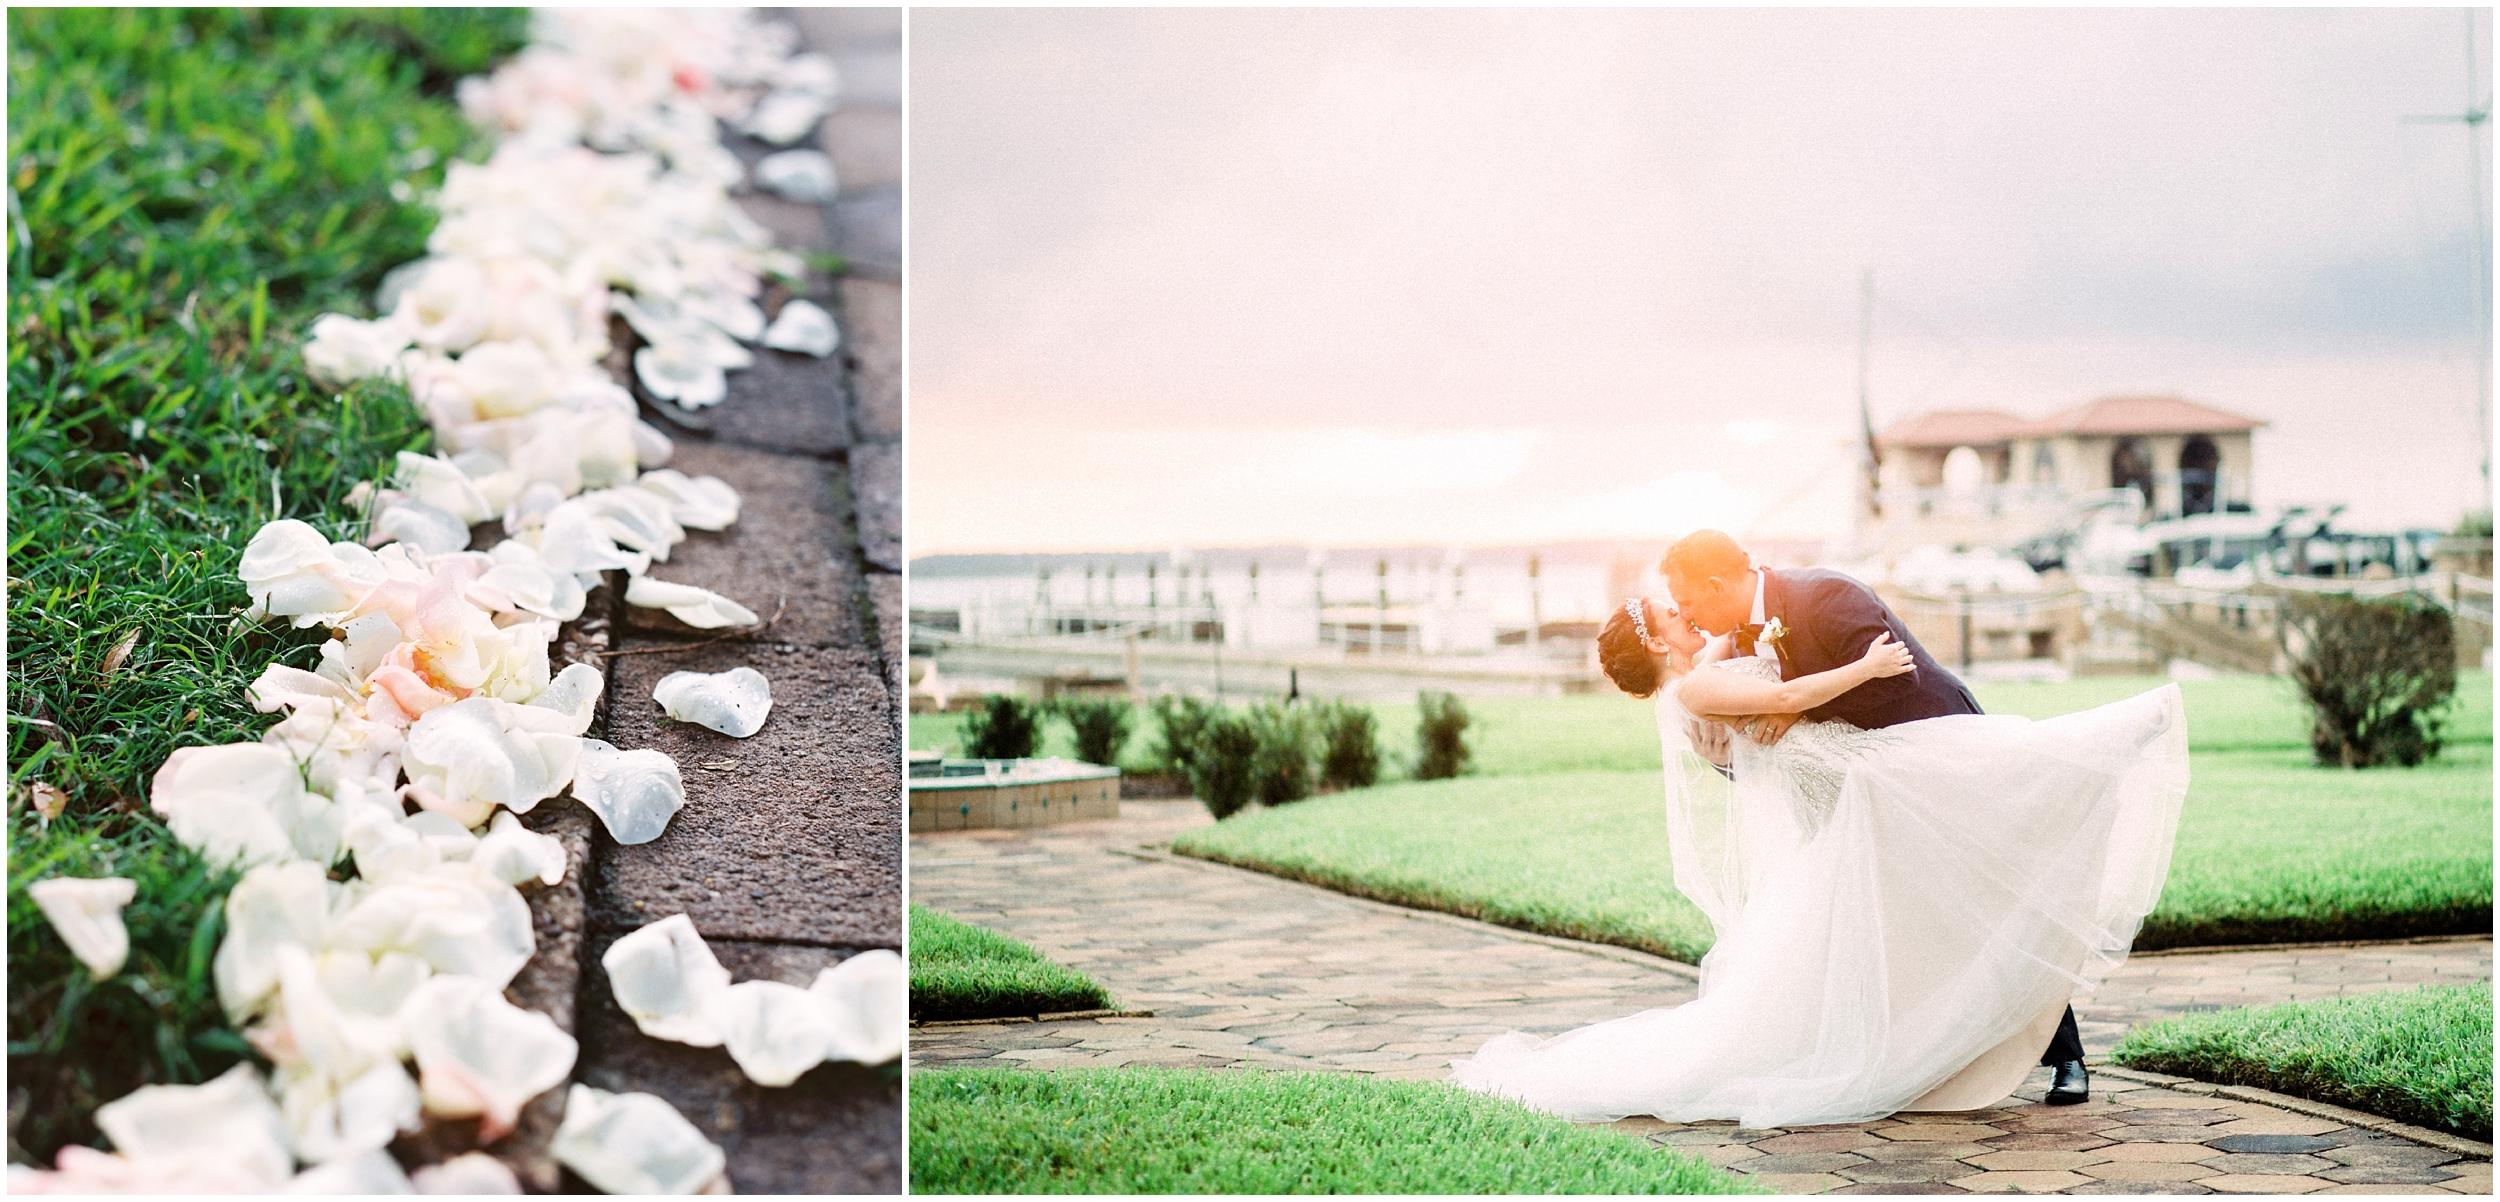 Lisa Silva Photography- Ponte Vedra Beach and Jacksonville, Florida Fine Art Film Wedding Photography